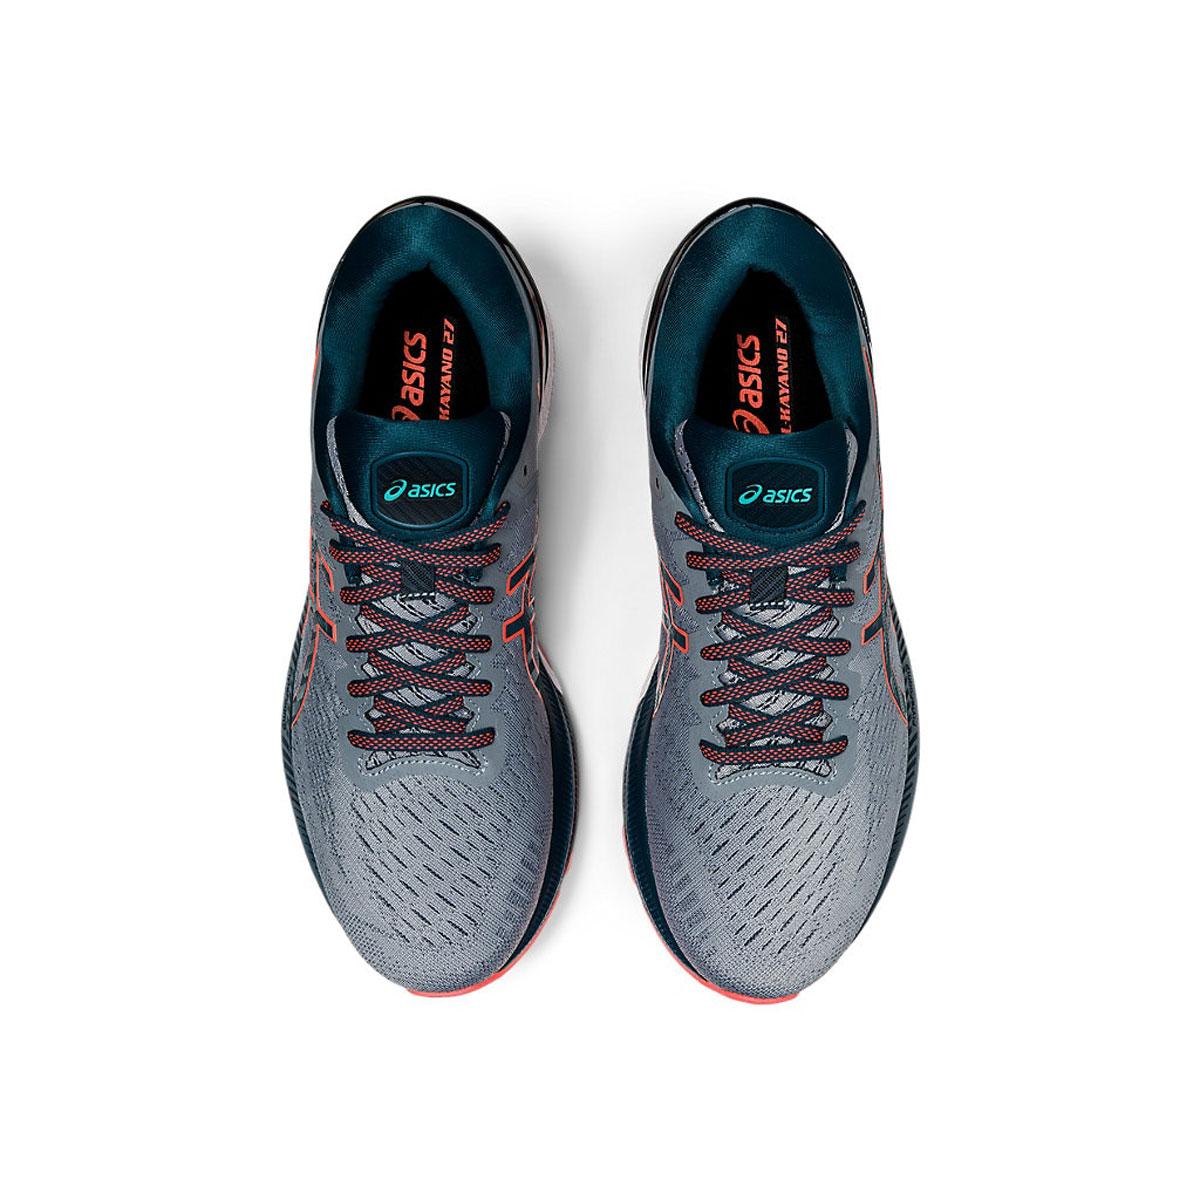 Men's Asics GEL-Kayano 27 Running Shoe - Color: Sheet Rock/Magn (Regular Width) - Size: 6, Sheet Rock/Magnetic Blue, large, image 6